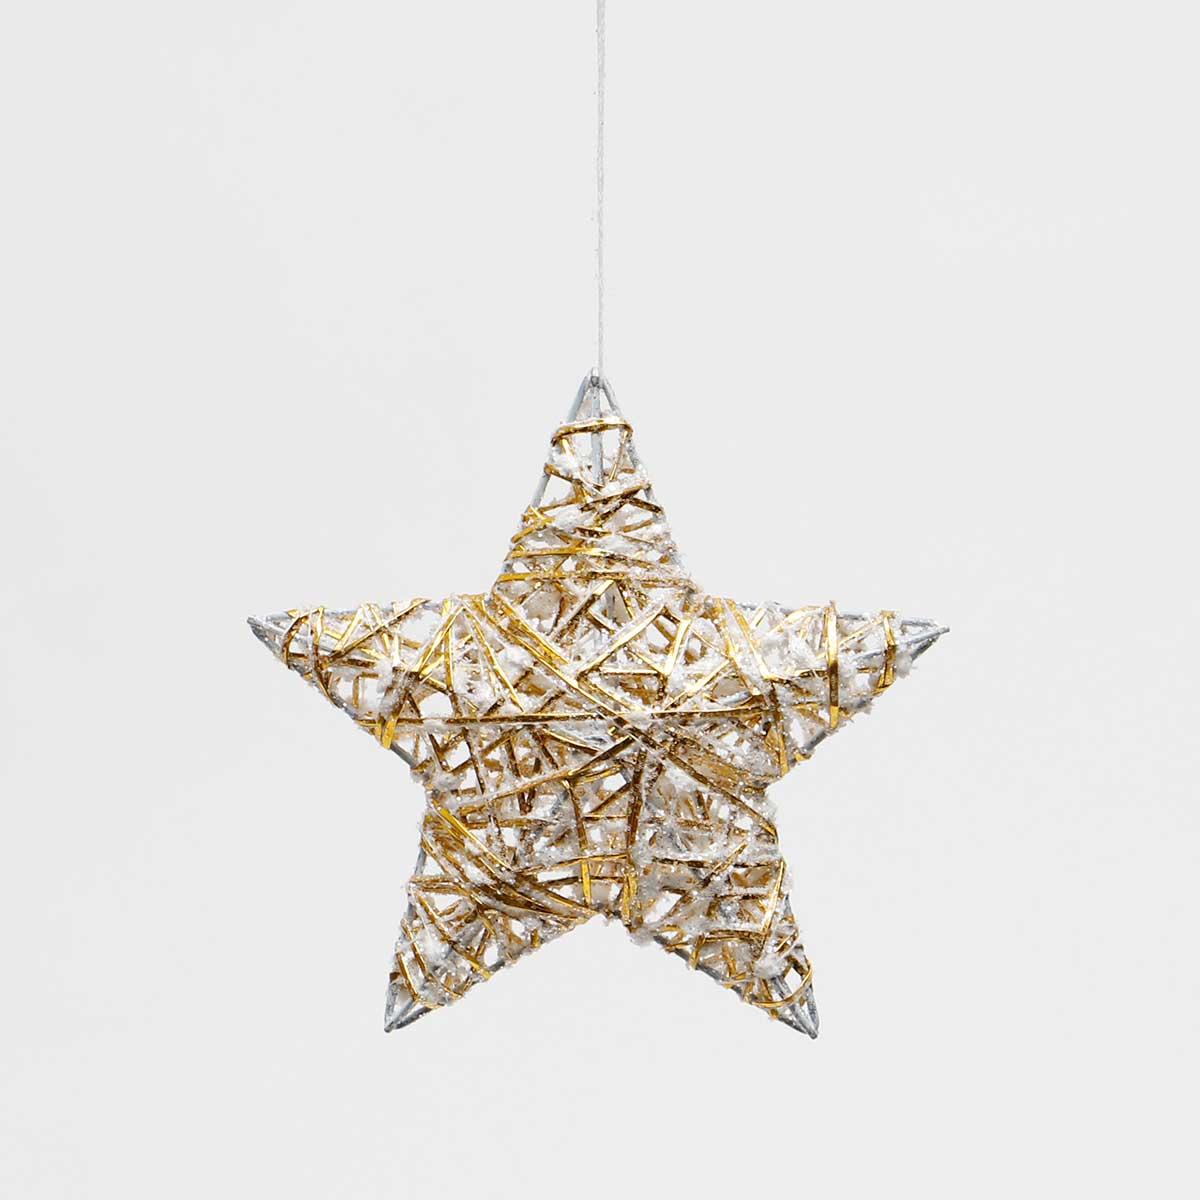 GALA WHITE/GOLD 3-D STAR ORNAMENT AMENT